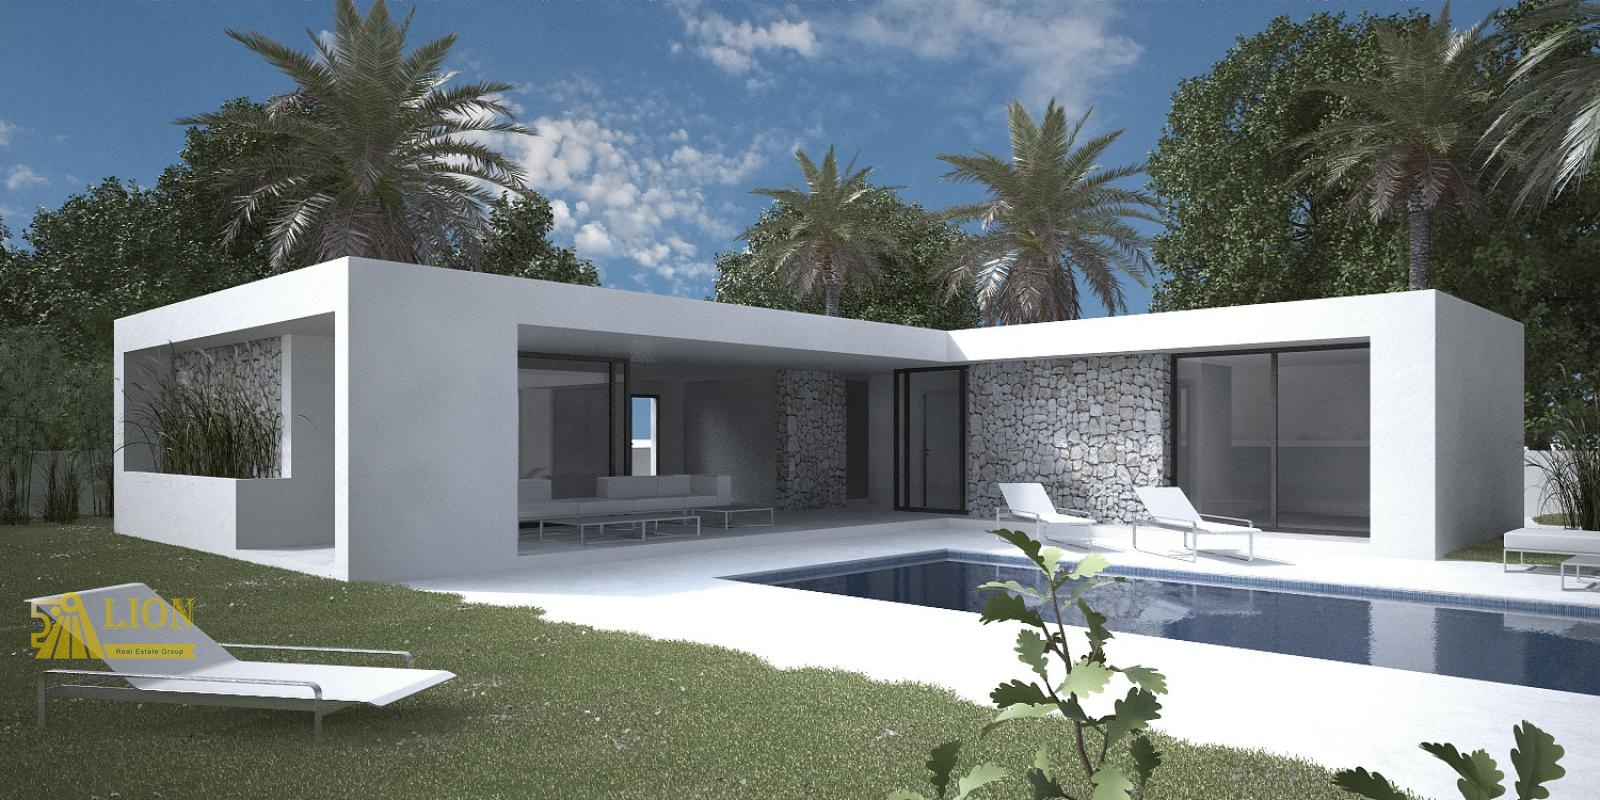 Design » Chalet Diseno Moderno - Galería de fotos de decoración ...